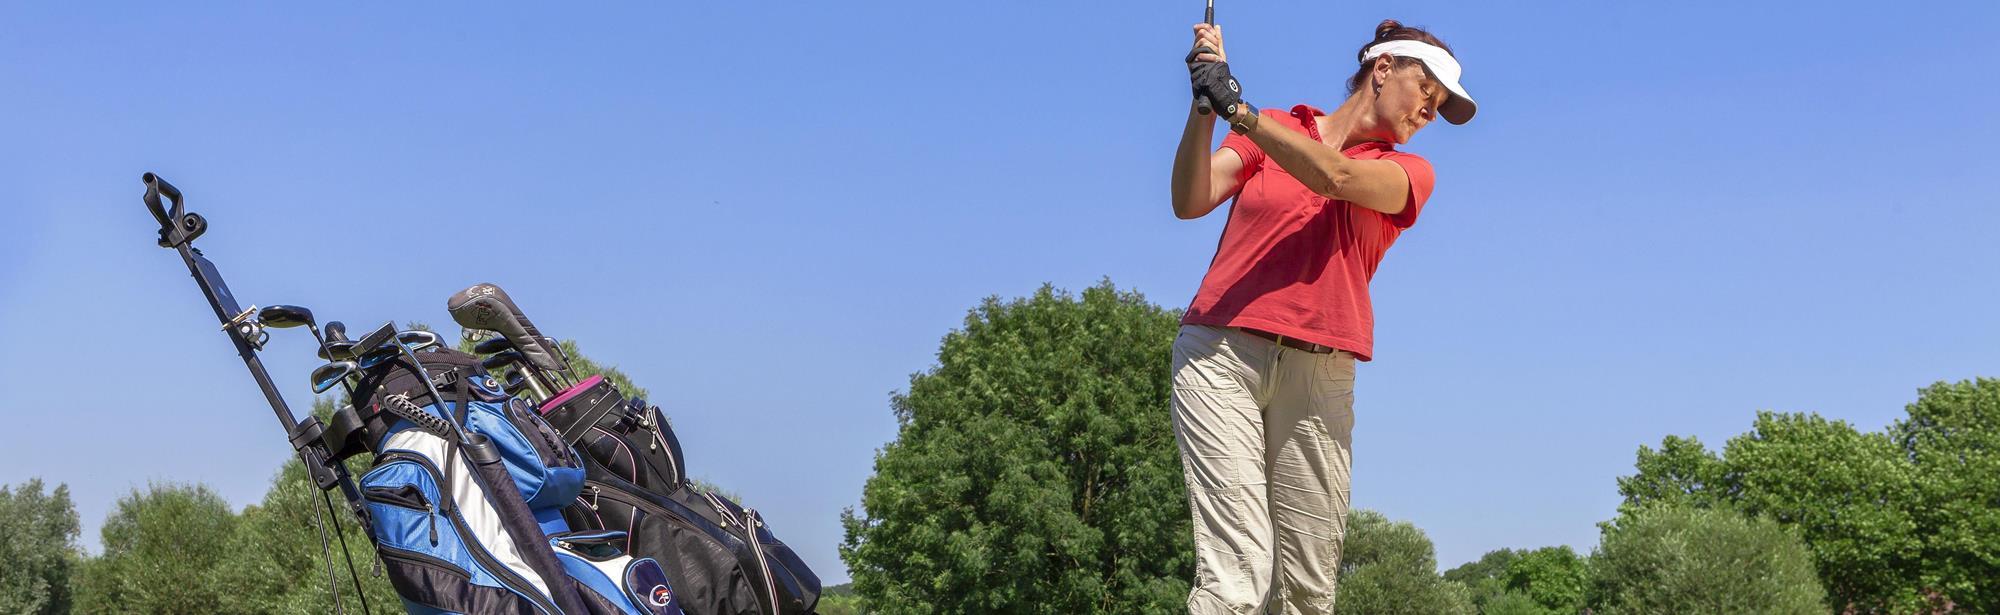 Adventure Golf Landal Hoog Vaals